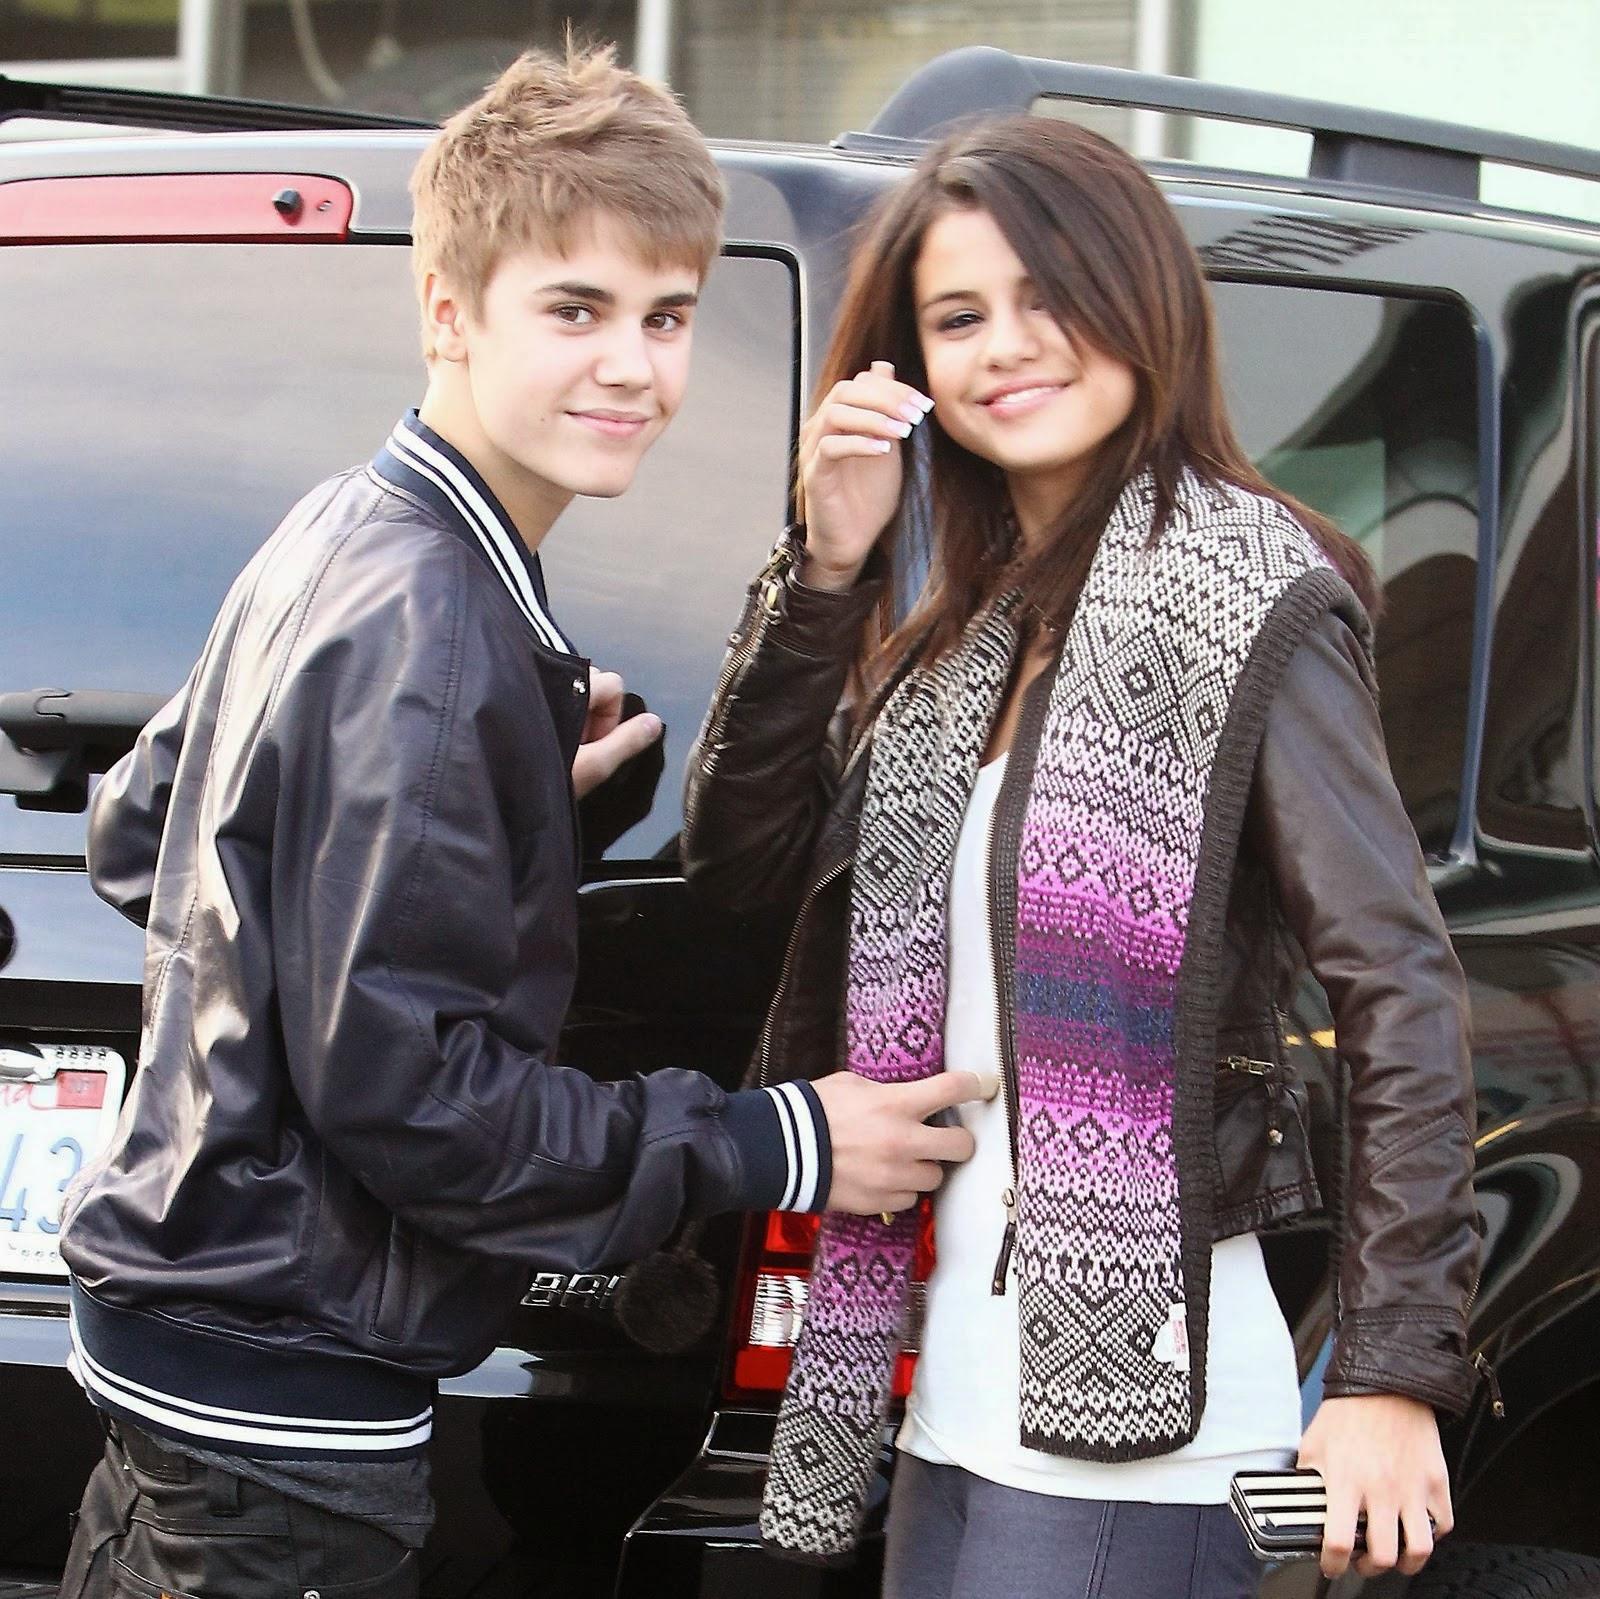 HD WALLPAPERS FREE DOWNLOAD: Justin Bieber & Selena Gomez ...